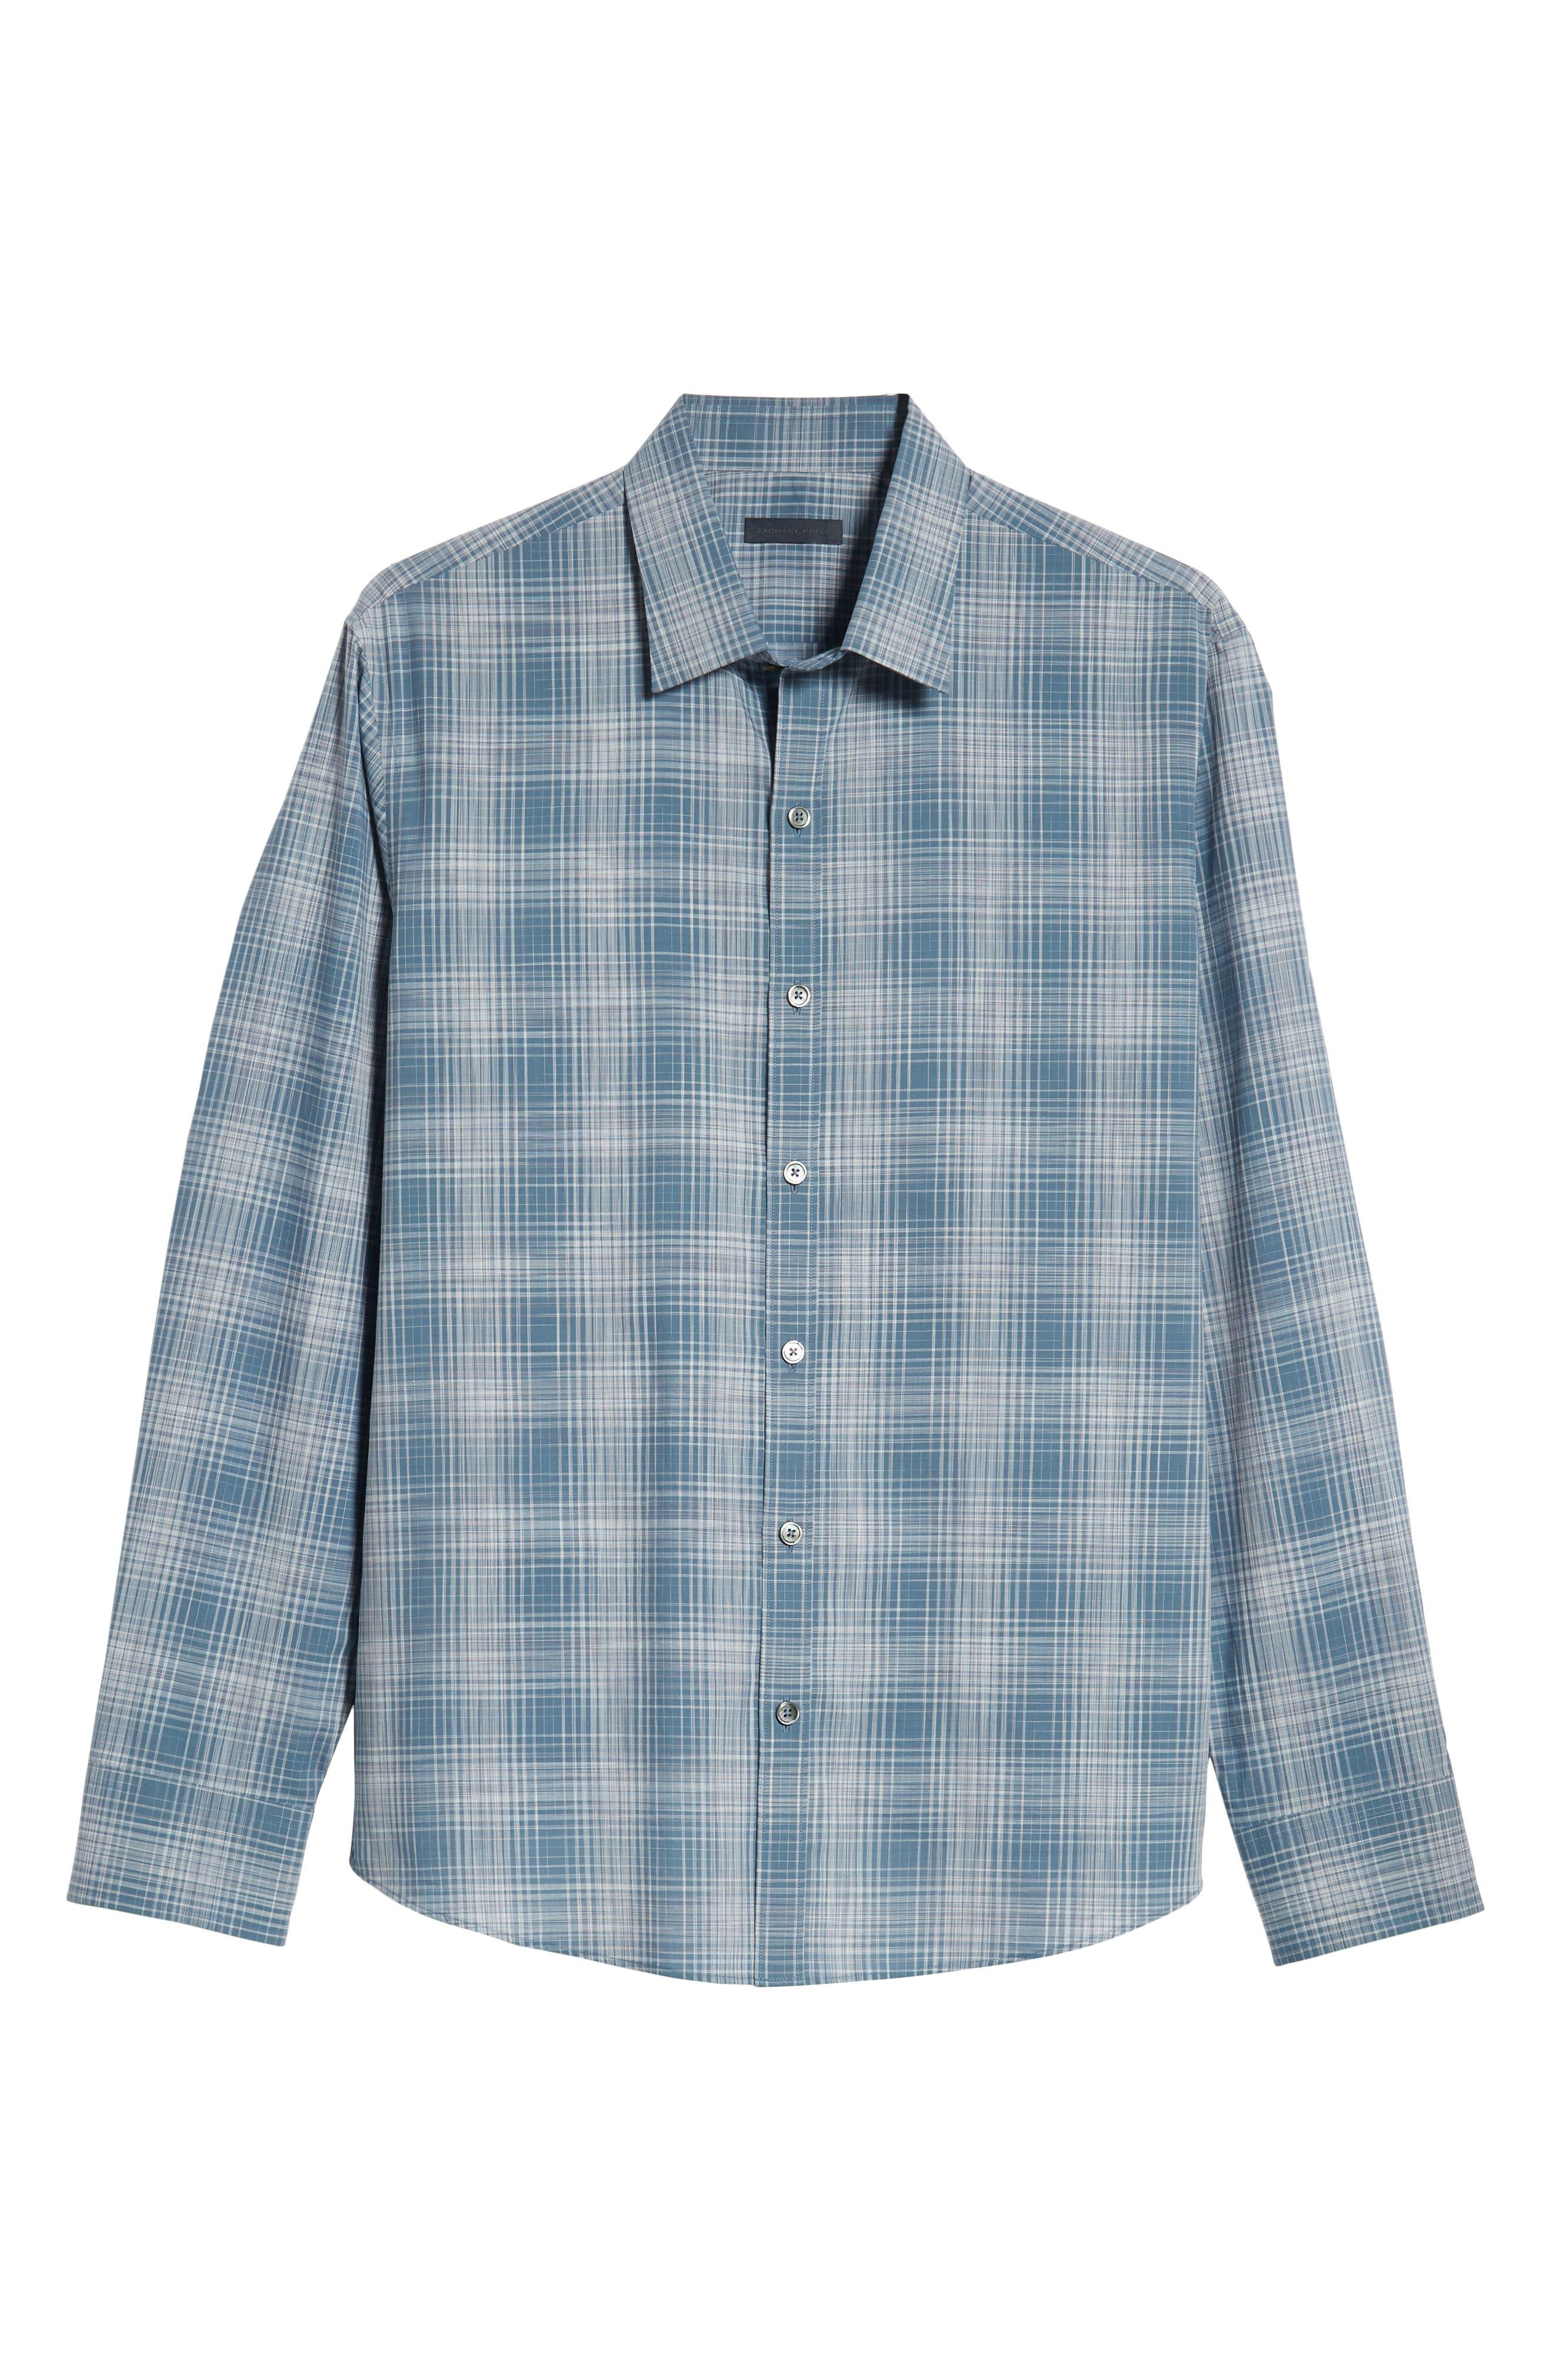 Slater Check Sport Shirt,                             Alternate thumbnail 5, color,                             PALE BLUE